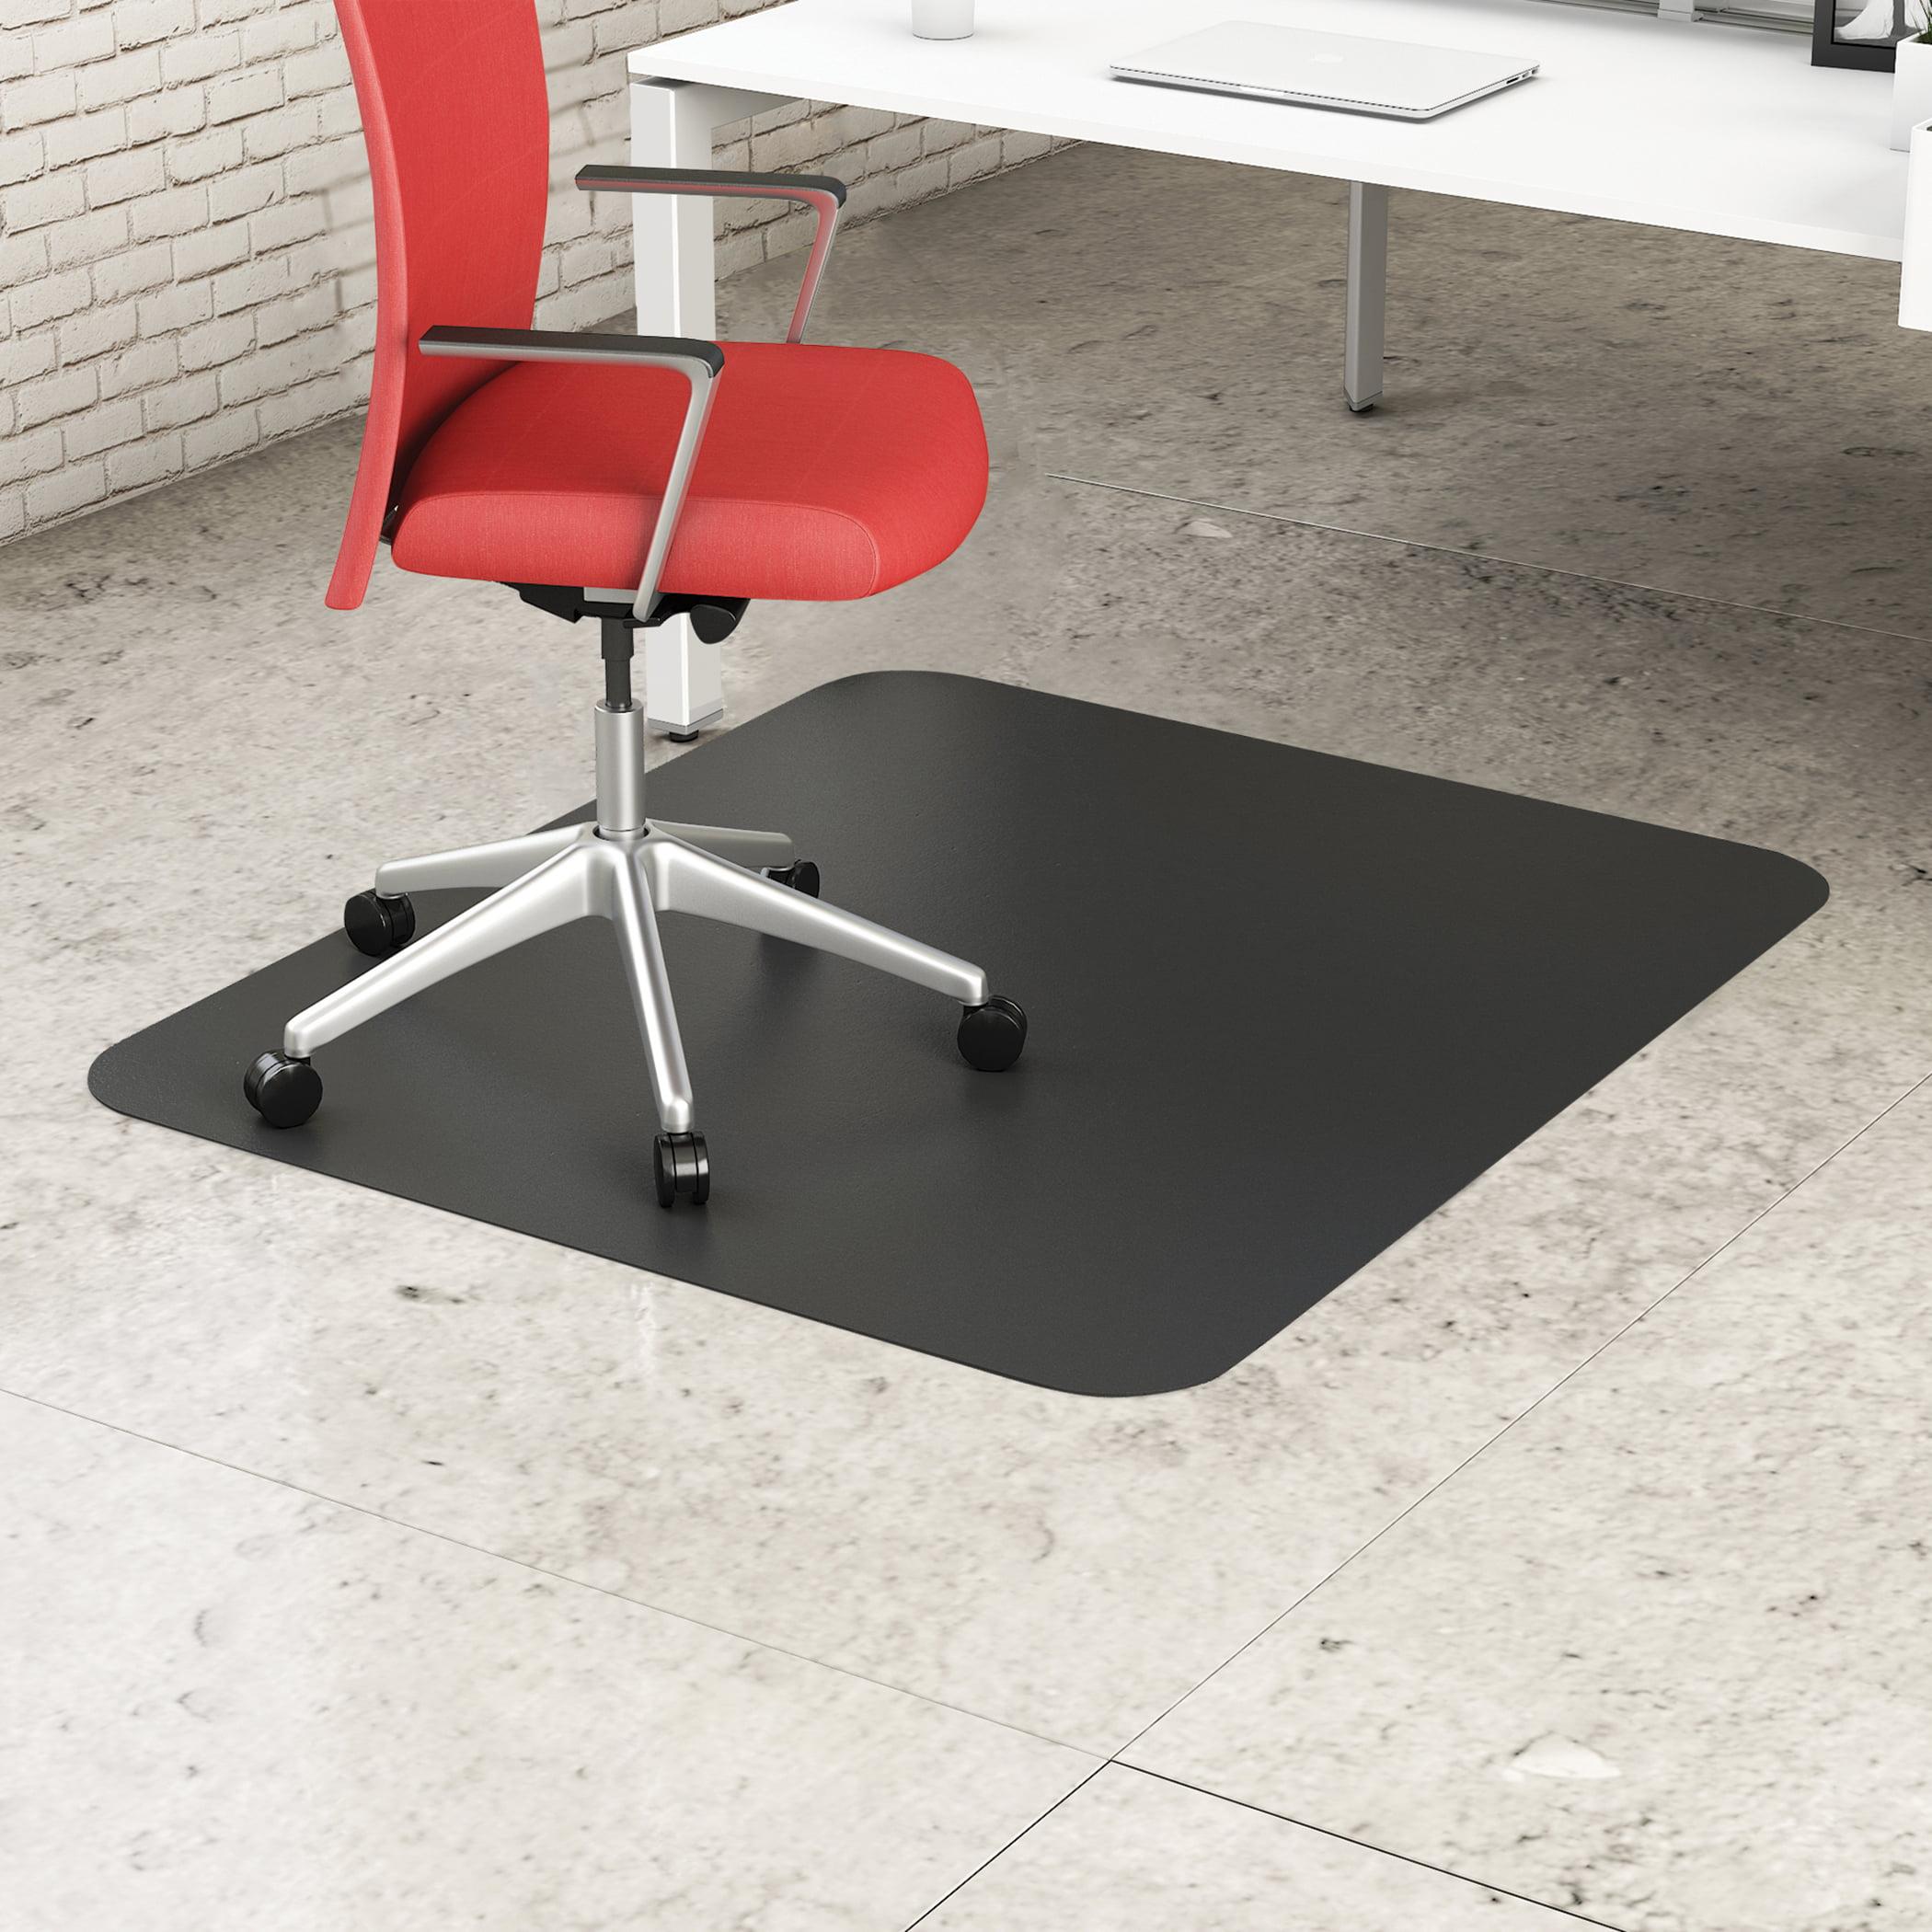 "CM21242BLK Office reception home carpet floor protector Economic chair mat Straight Edge 45"" x 53"" Black Rectangle-Hard Floor Thickness Mat"